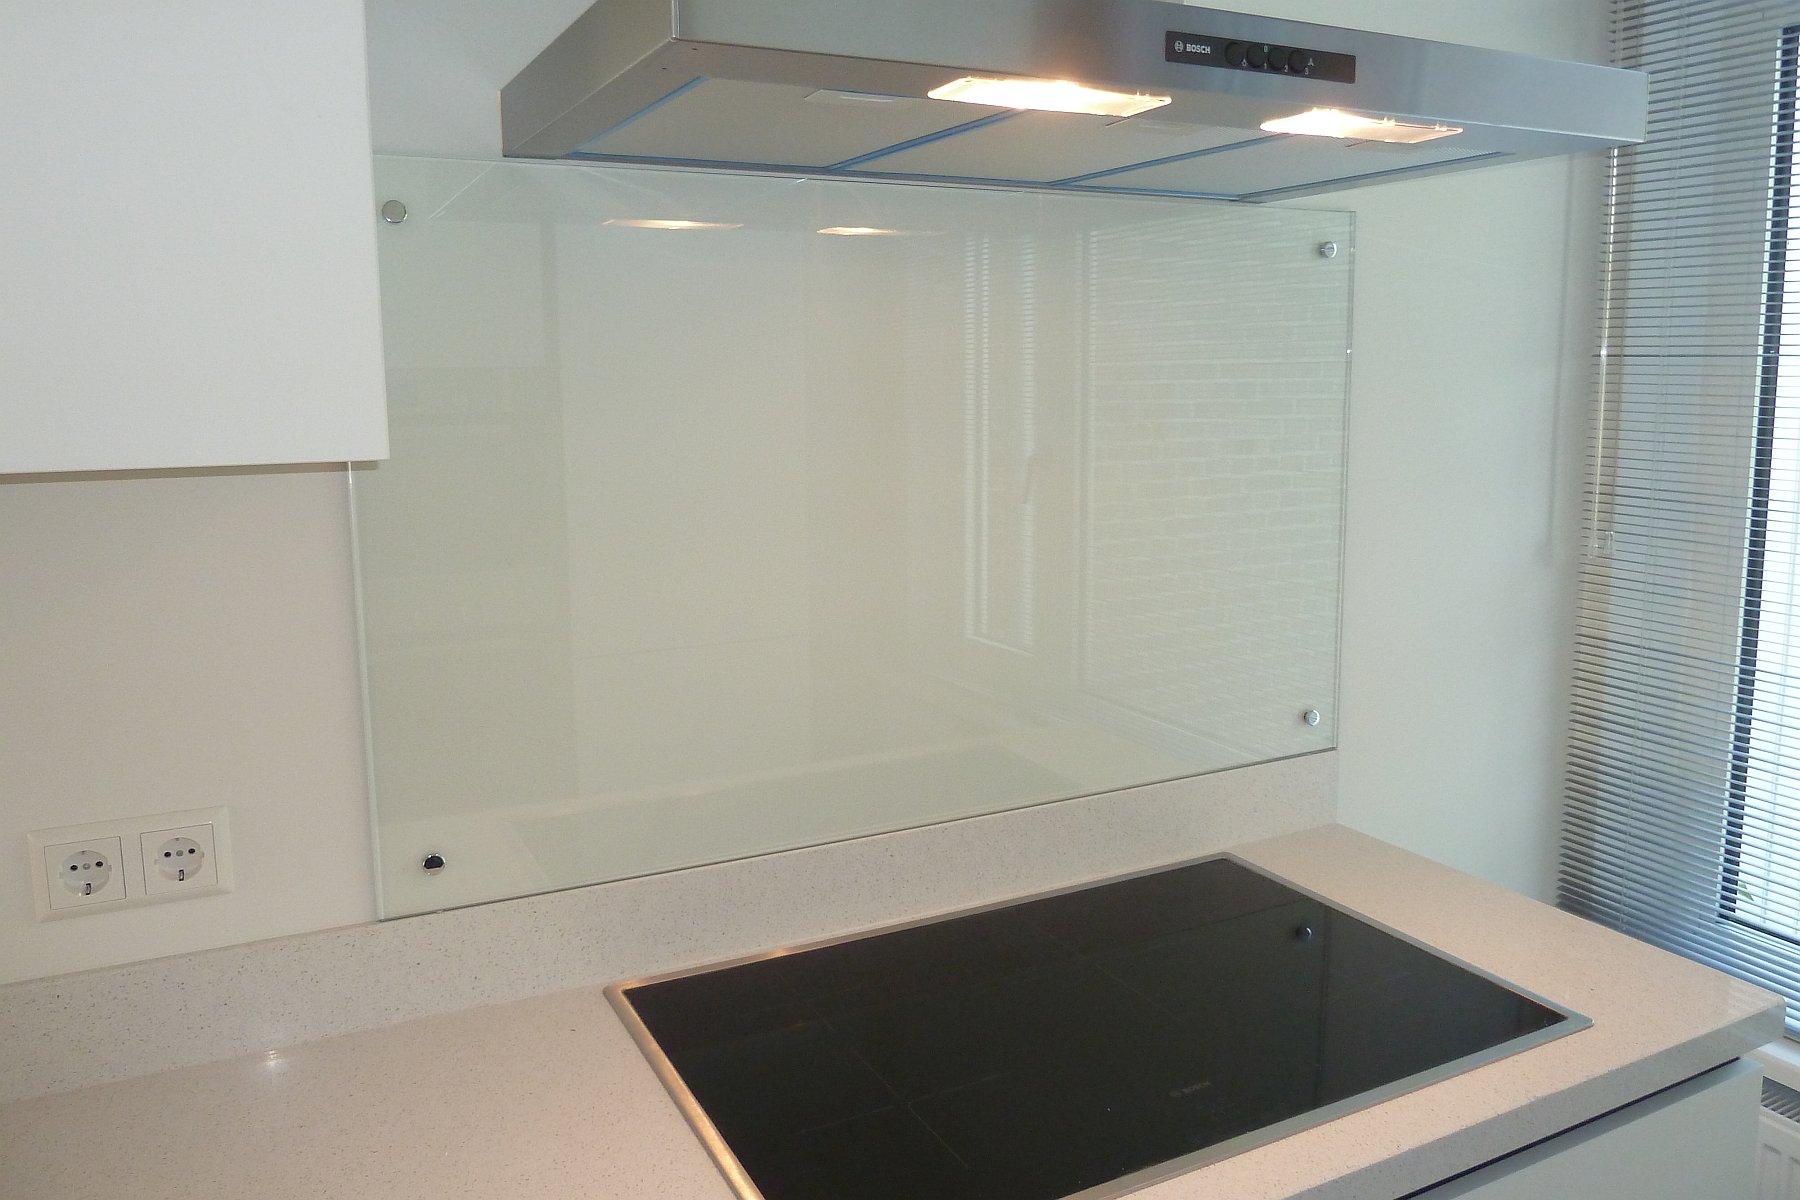 Glazen Spatwand Keuken : Glazen spatwand plaatsen in keuken den haag